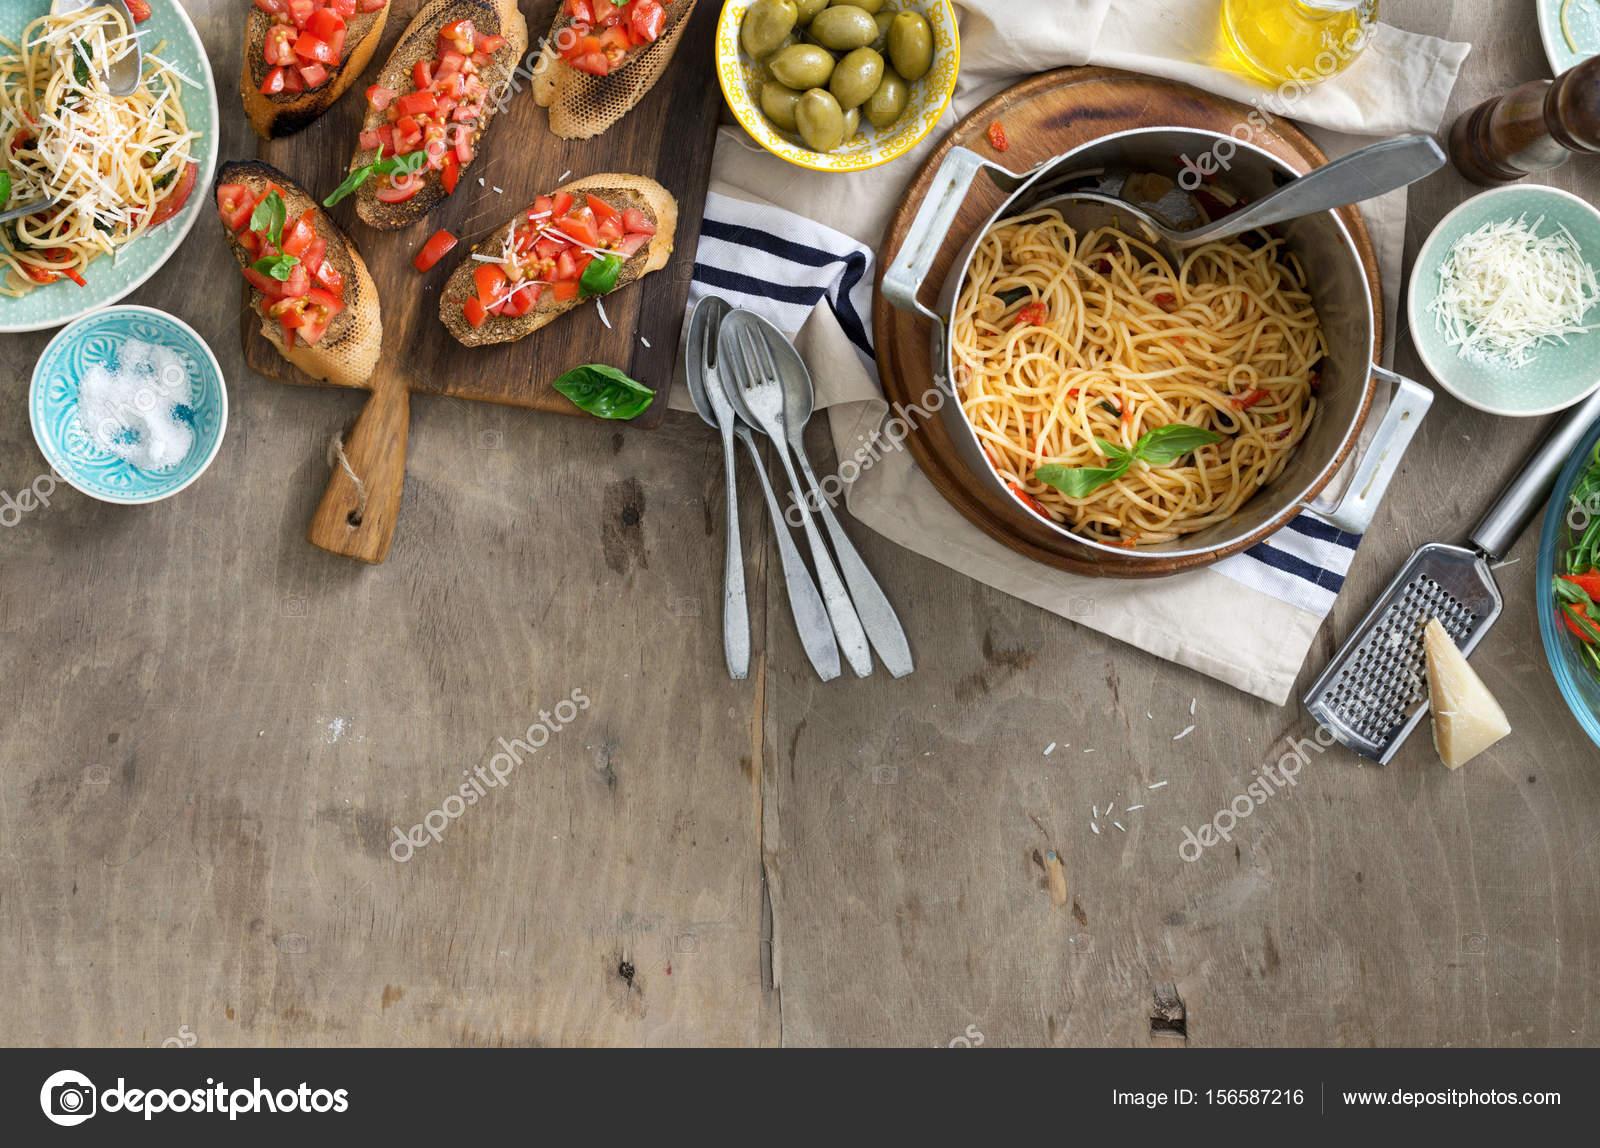 Italian Dinner Table With Pasta And Bruschetta On Wooden Table U2014 Stock  Photo #156587216